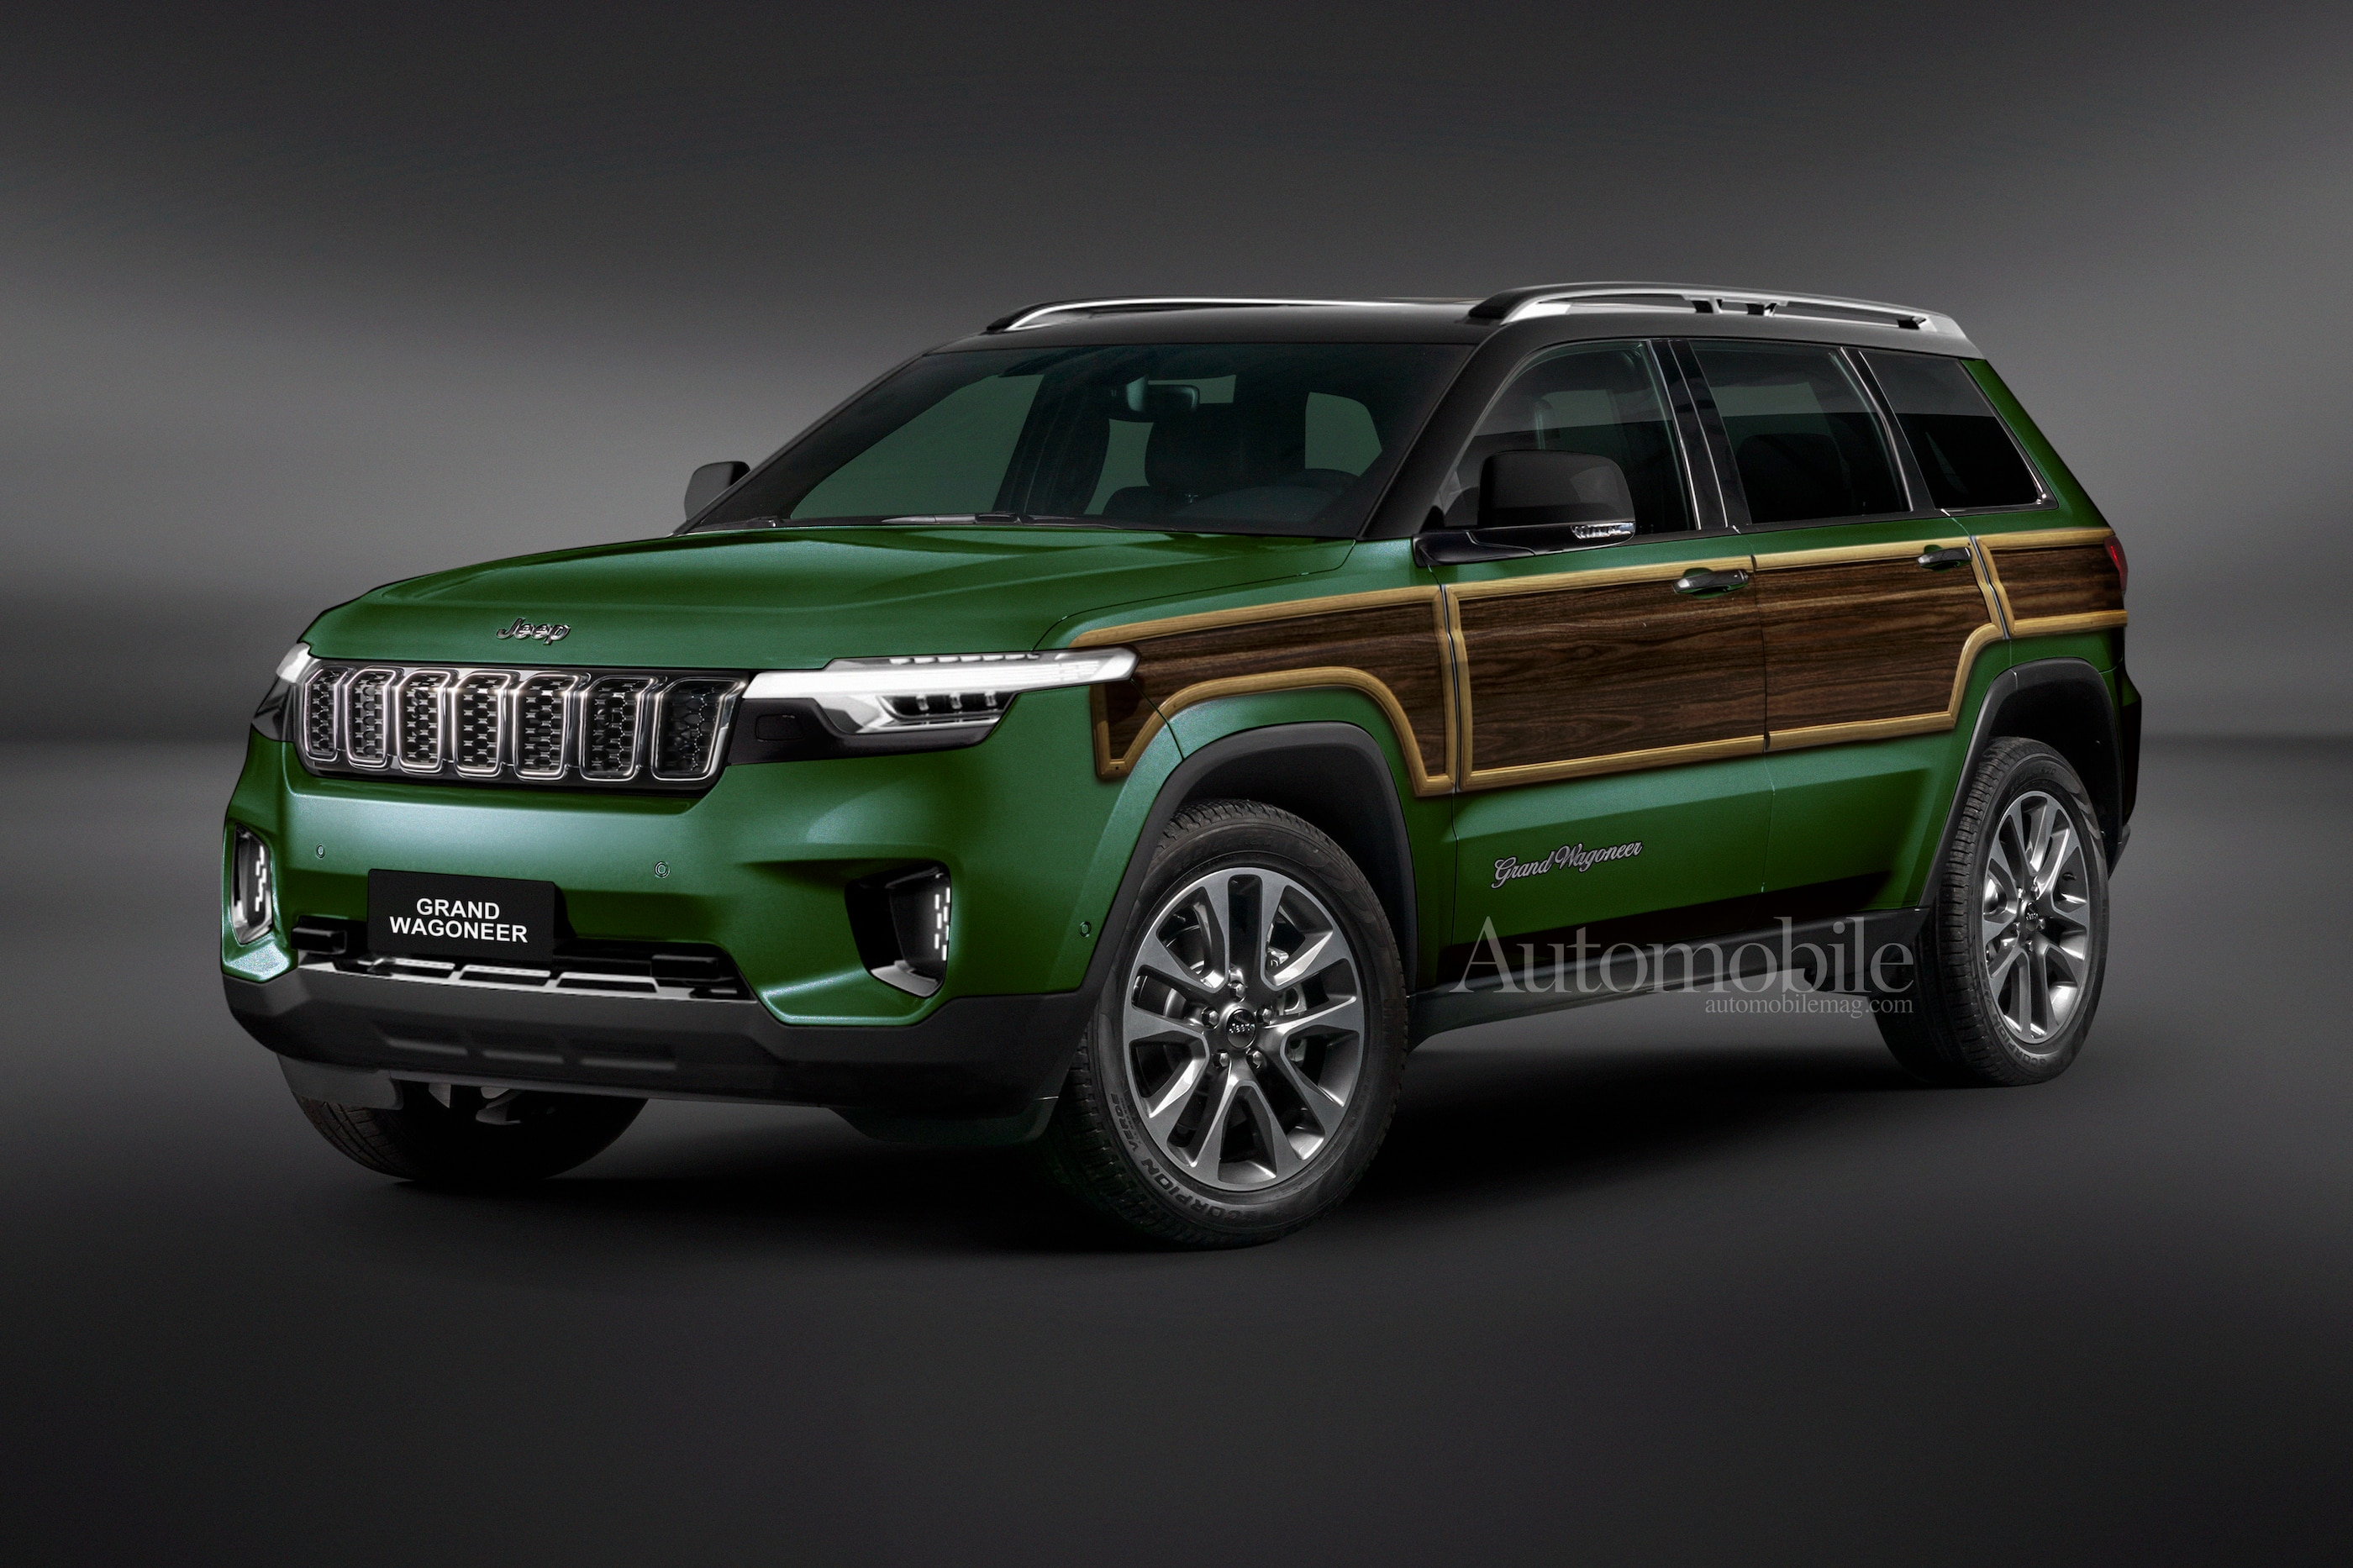 2020 The Jeep Grand Wagoneer Model